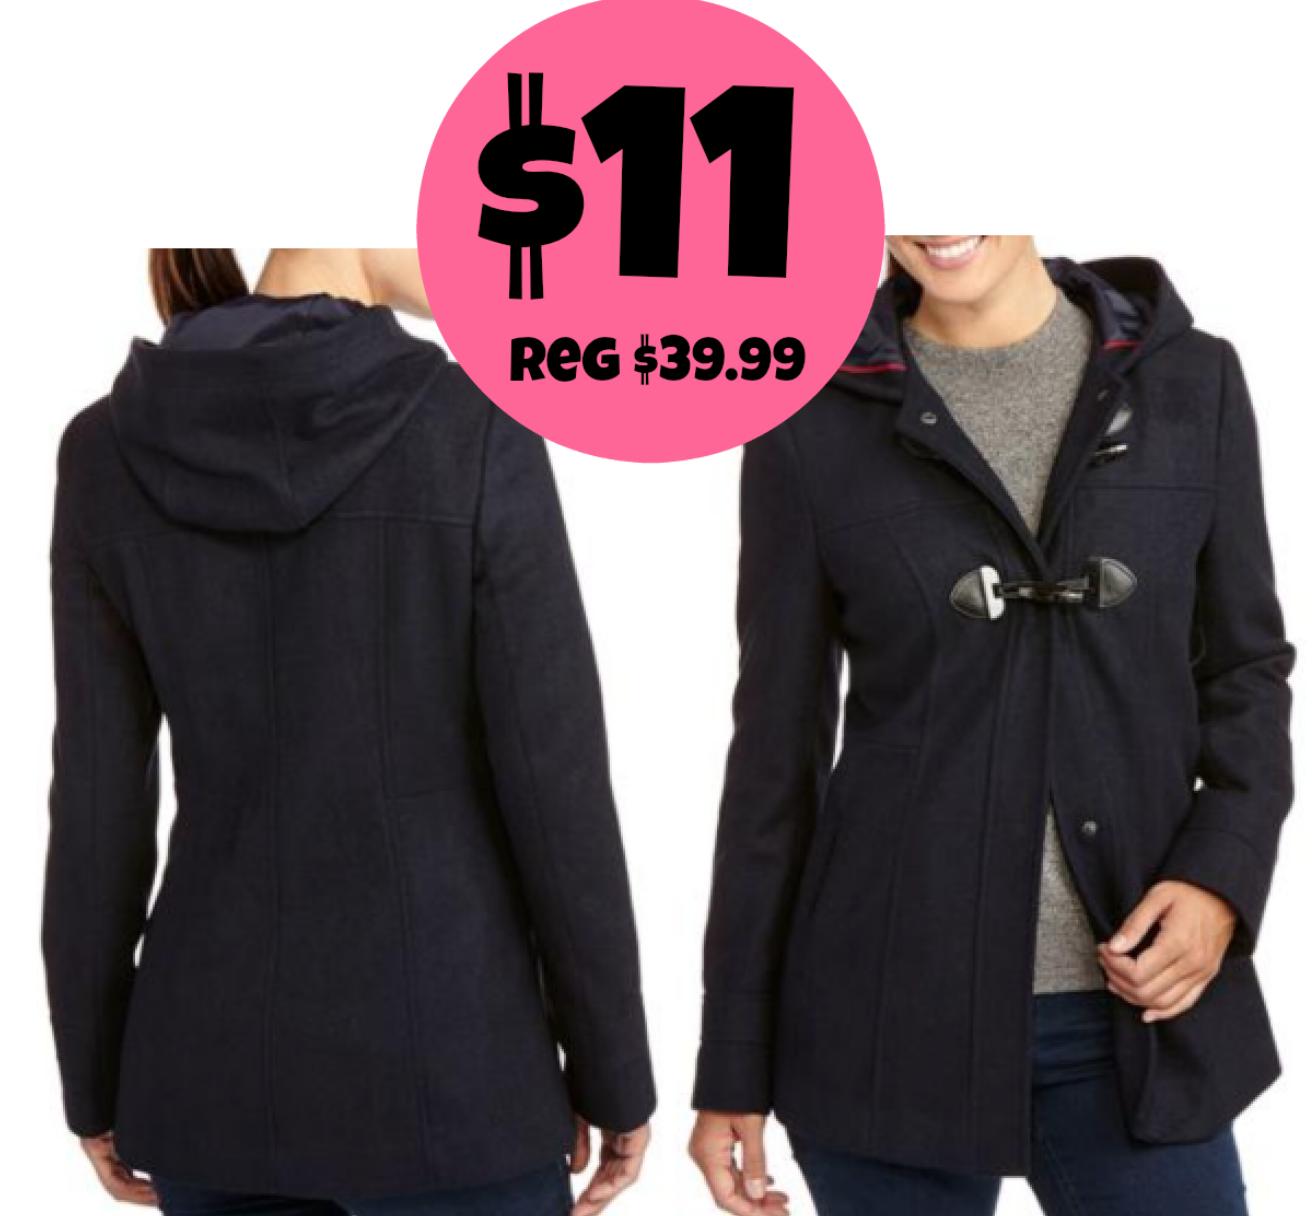 http://www.thebinderladies.com/2015/02/walmart-com-womens-faux-wool-hooded.html#.VOfDukLduyM